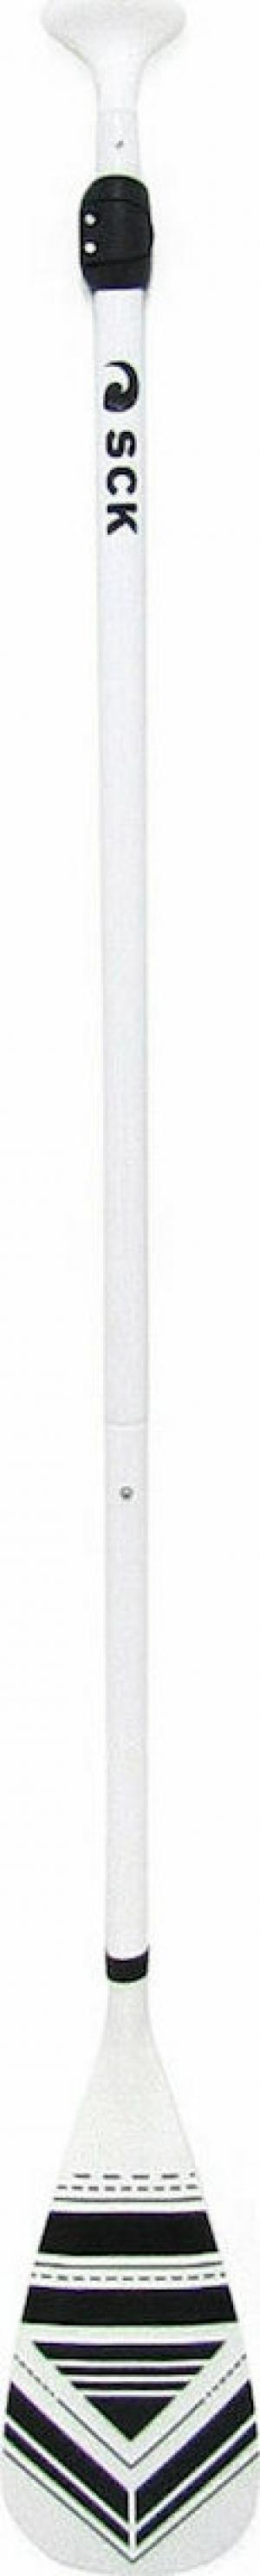 SCK PDL3-ALU2 Ρυθμιζομενο κουπί αλουμινίου 170-215cm Λευκό